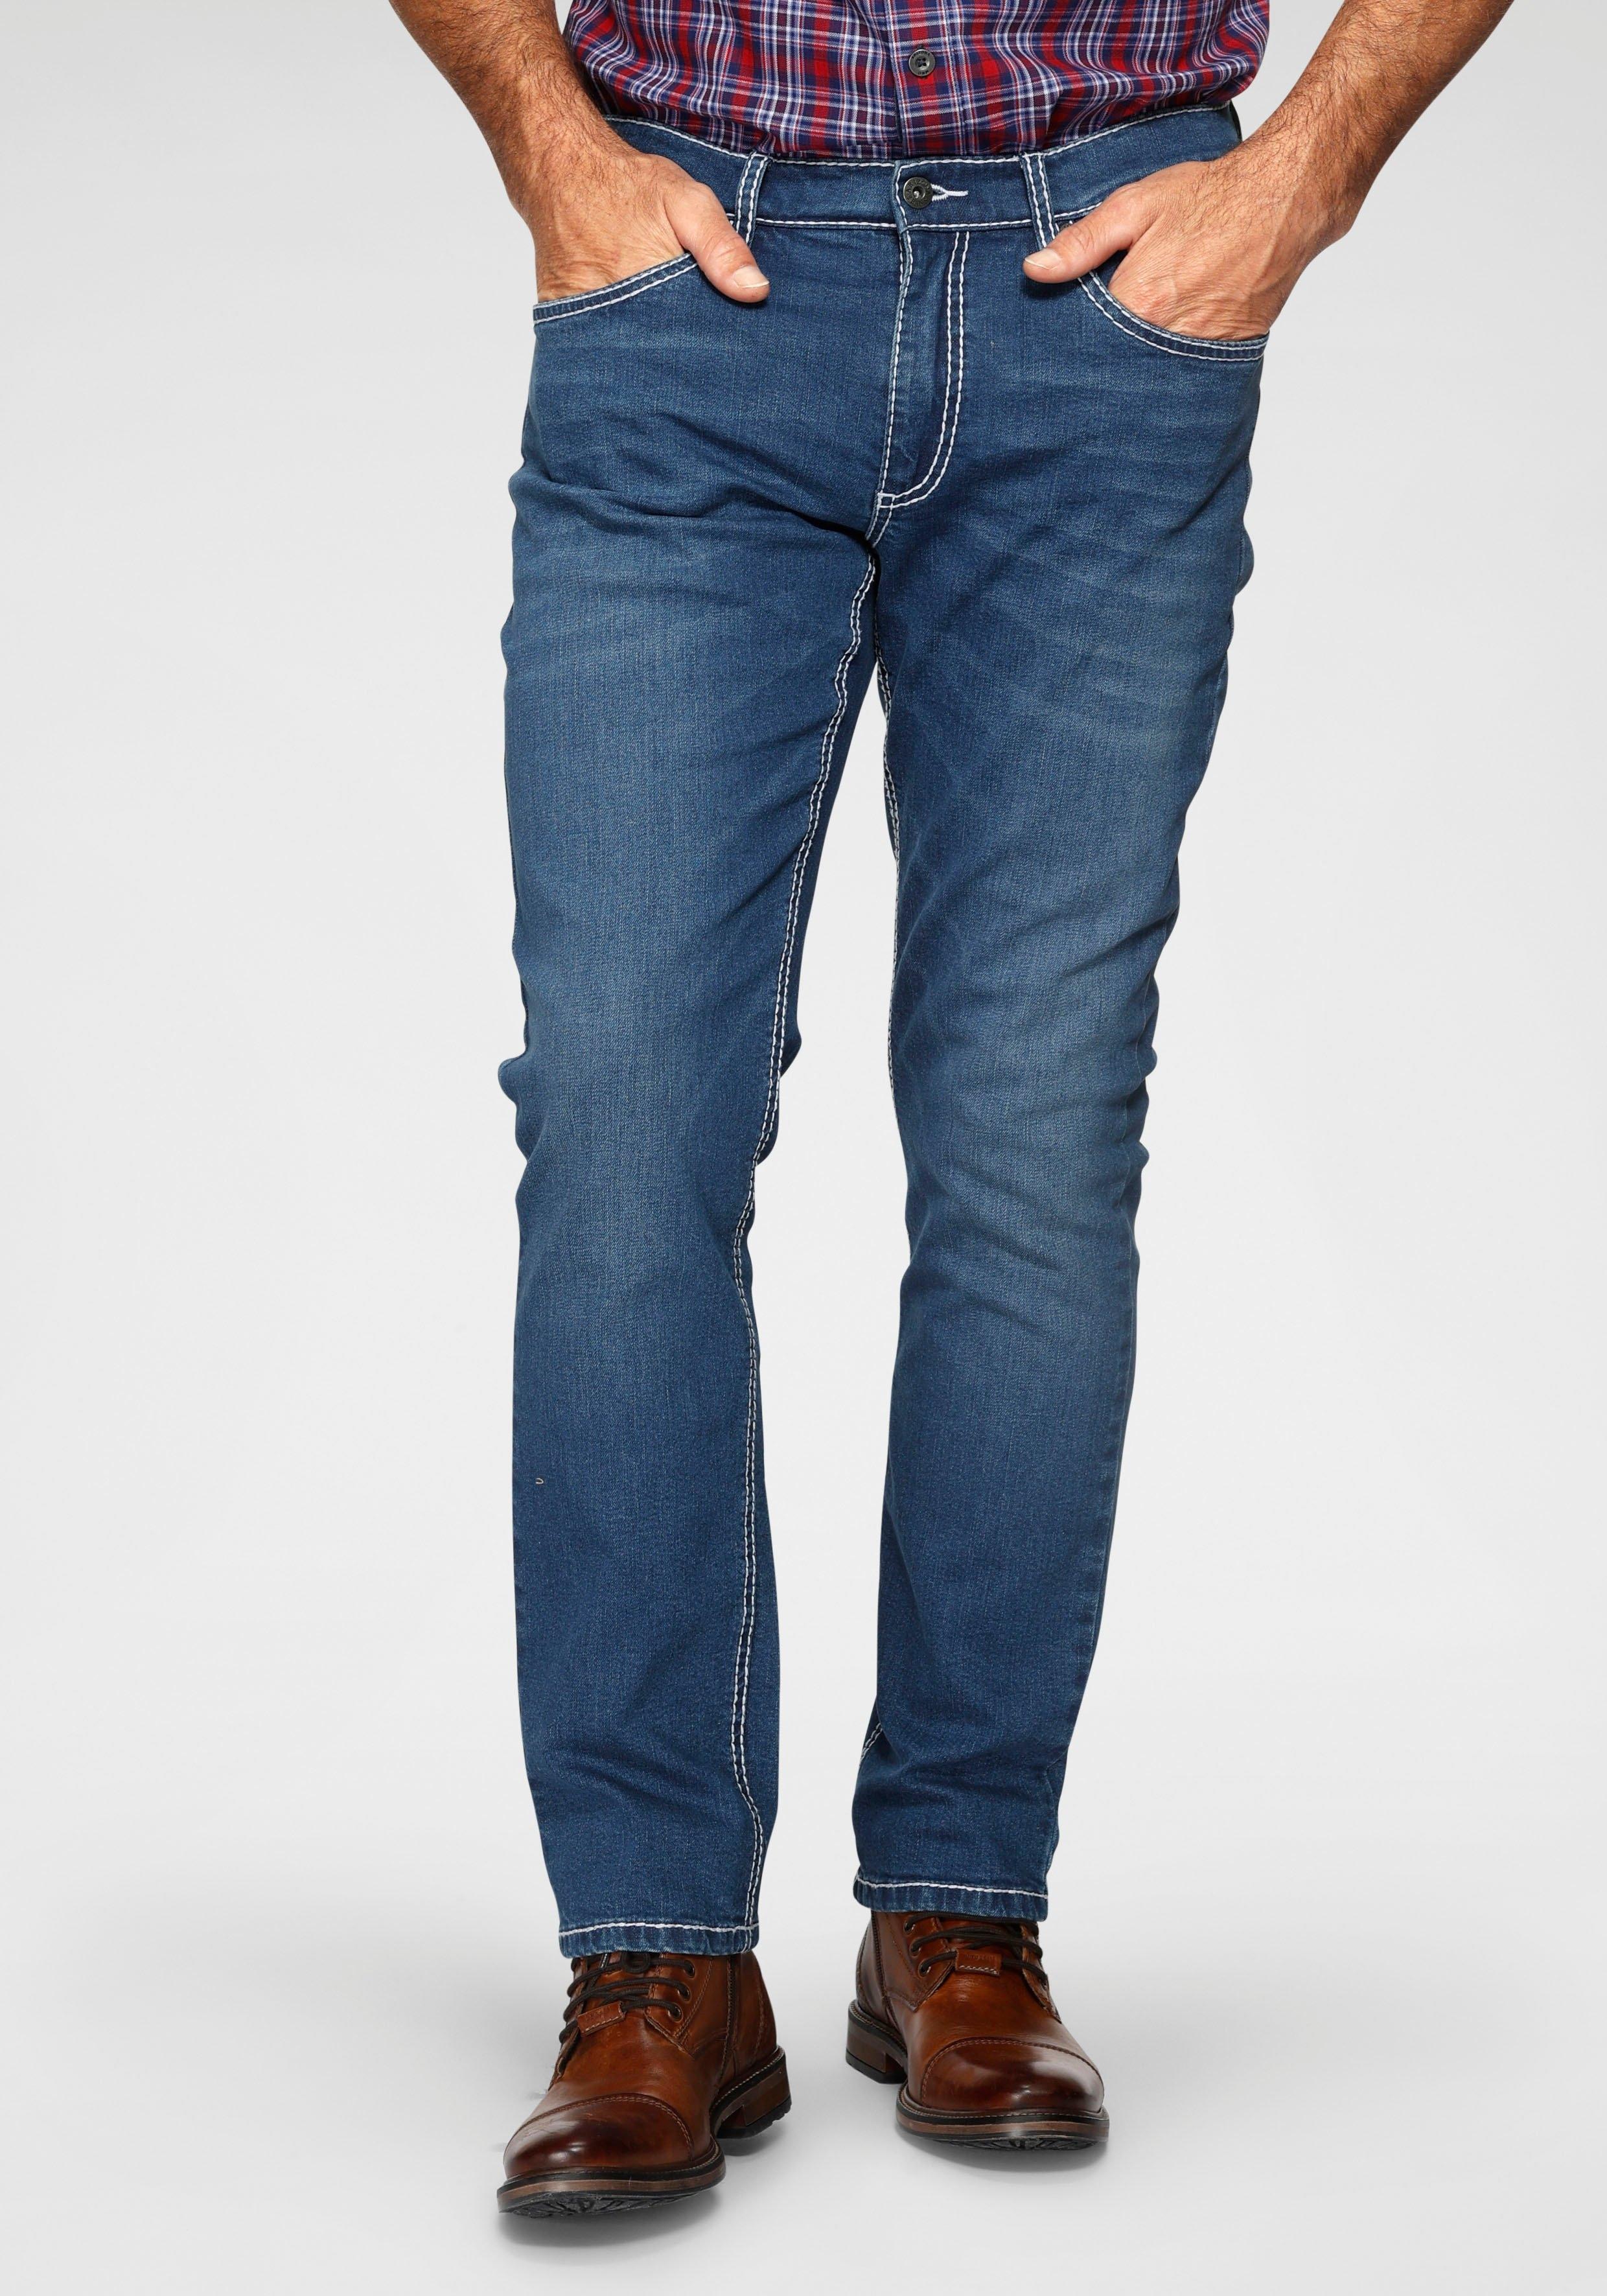 Arizona regular fit jeans - verschillende betaalmethodes